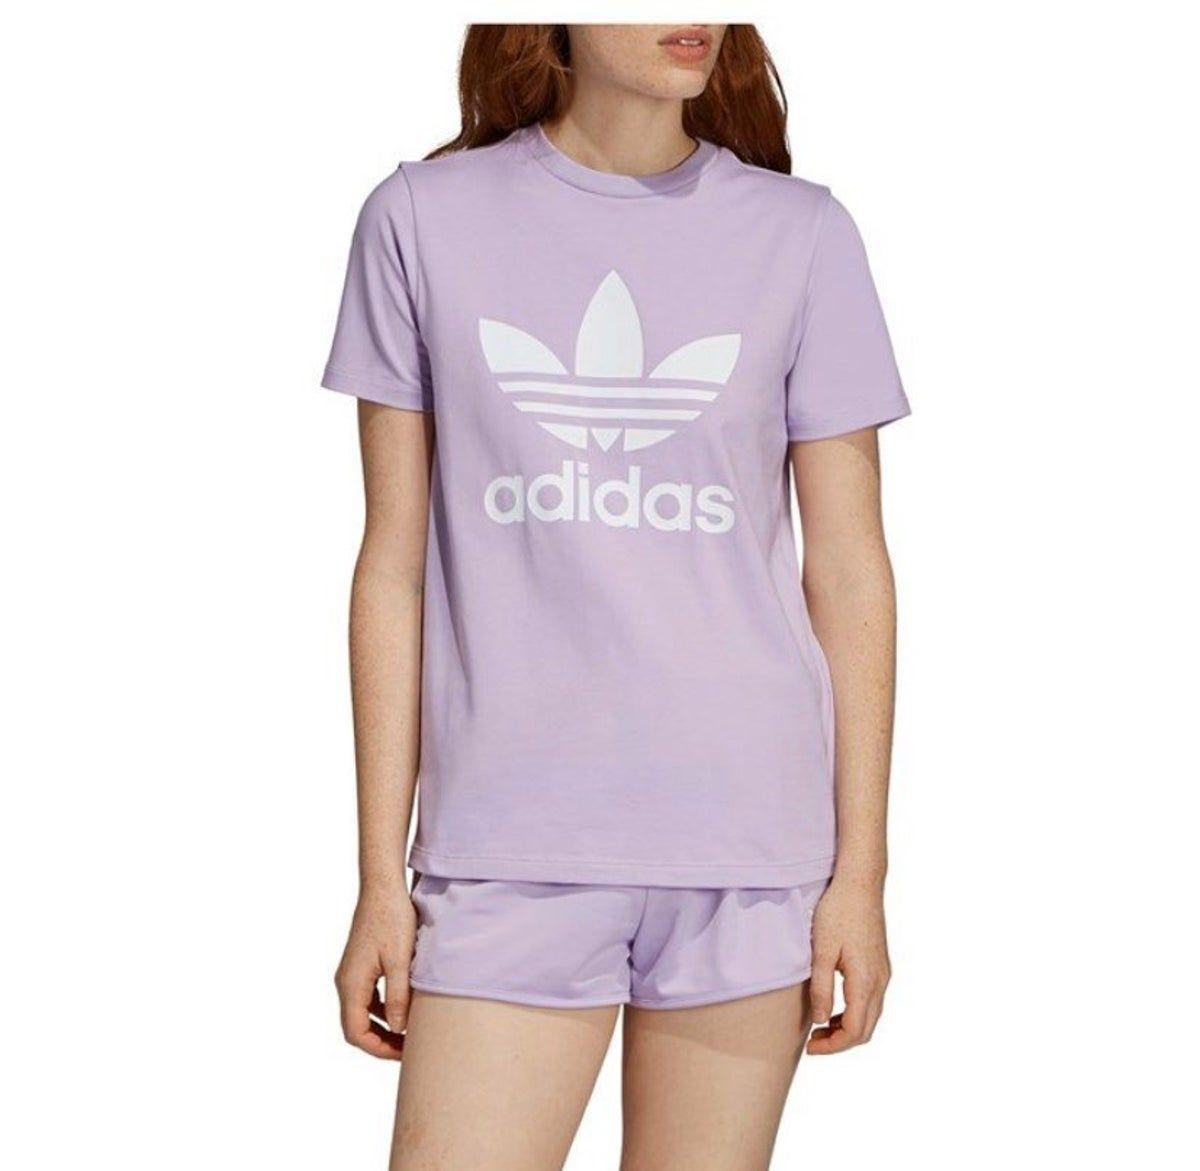 Adidas Trefoil Tee Shirt Adidas Trefoil Adidas Women Women [ 1171 x 1200 Pixel ]